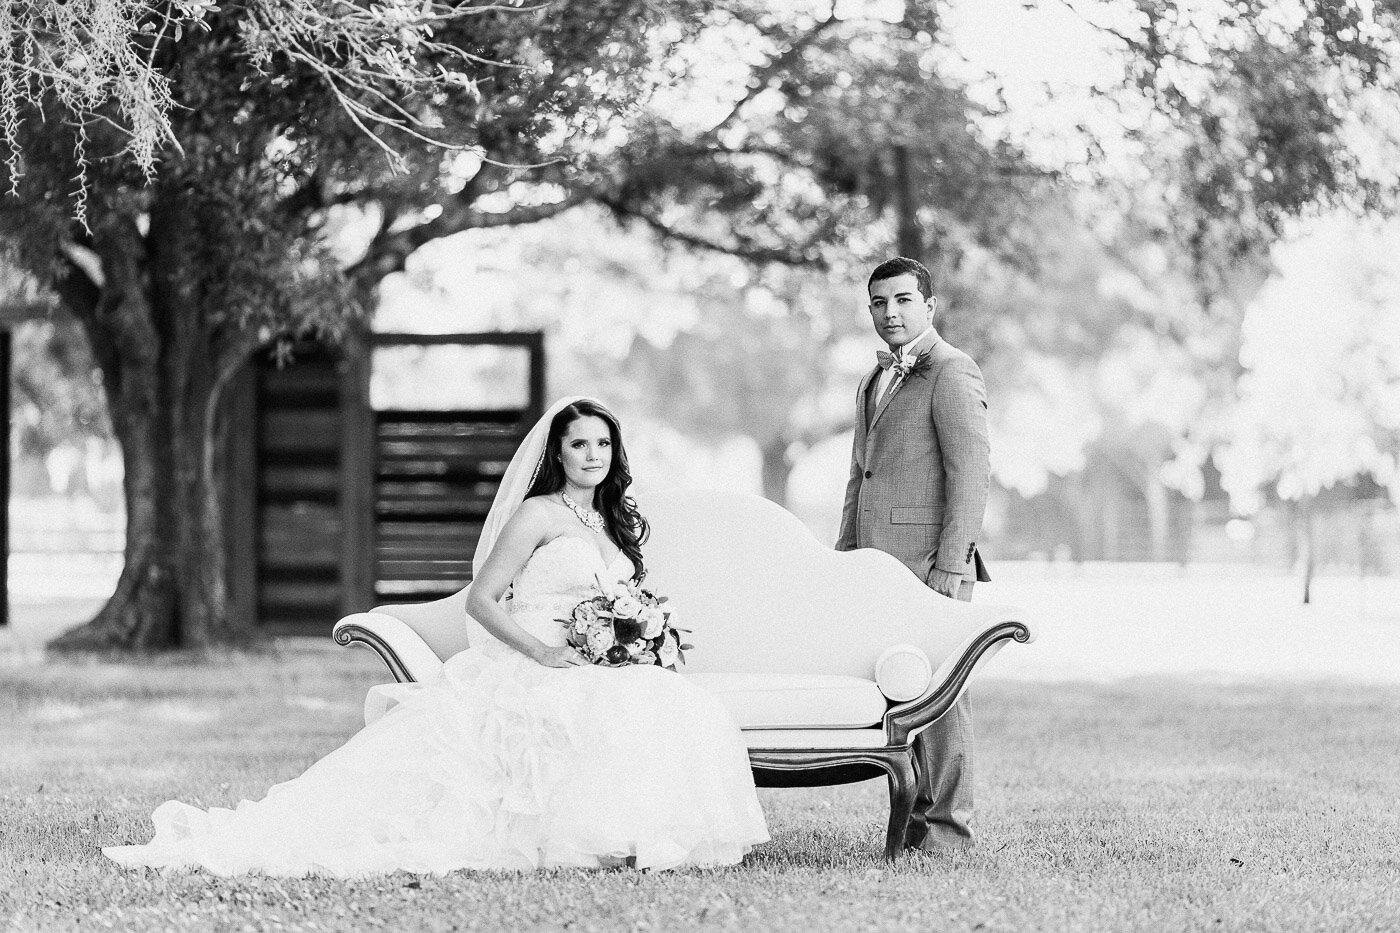 Lakeland-barn-wedding-at-white-horse-ranch-58.jpg